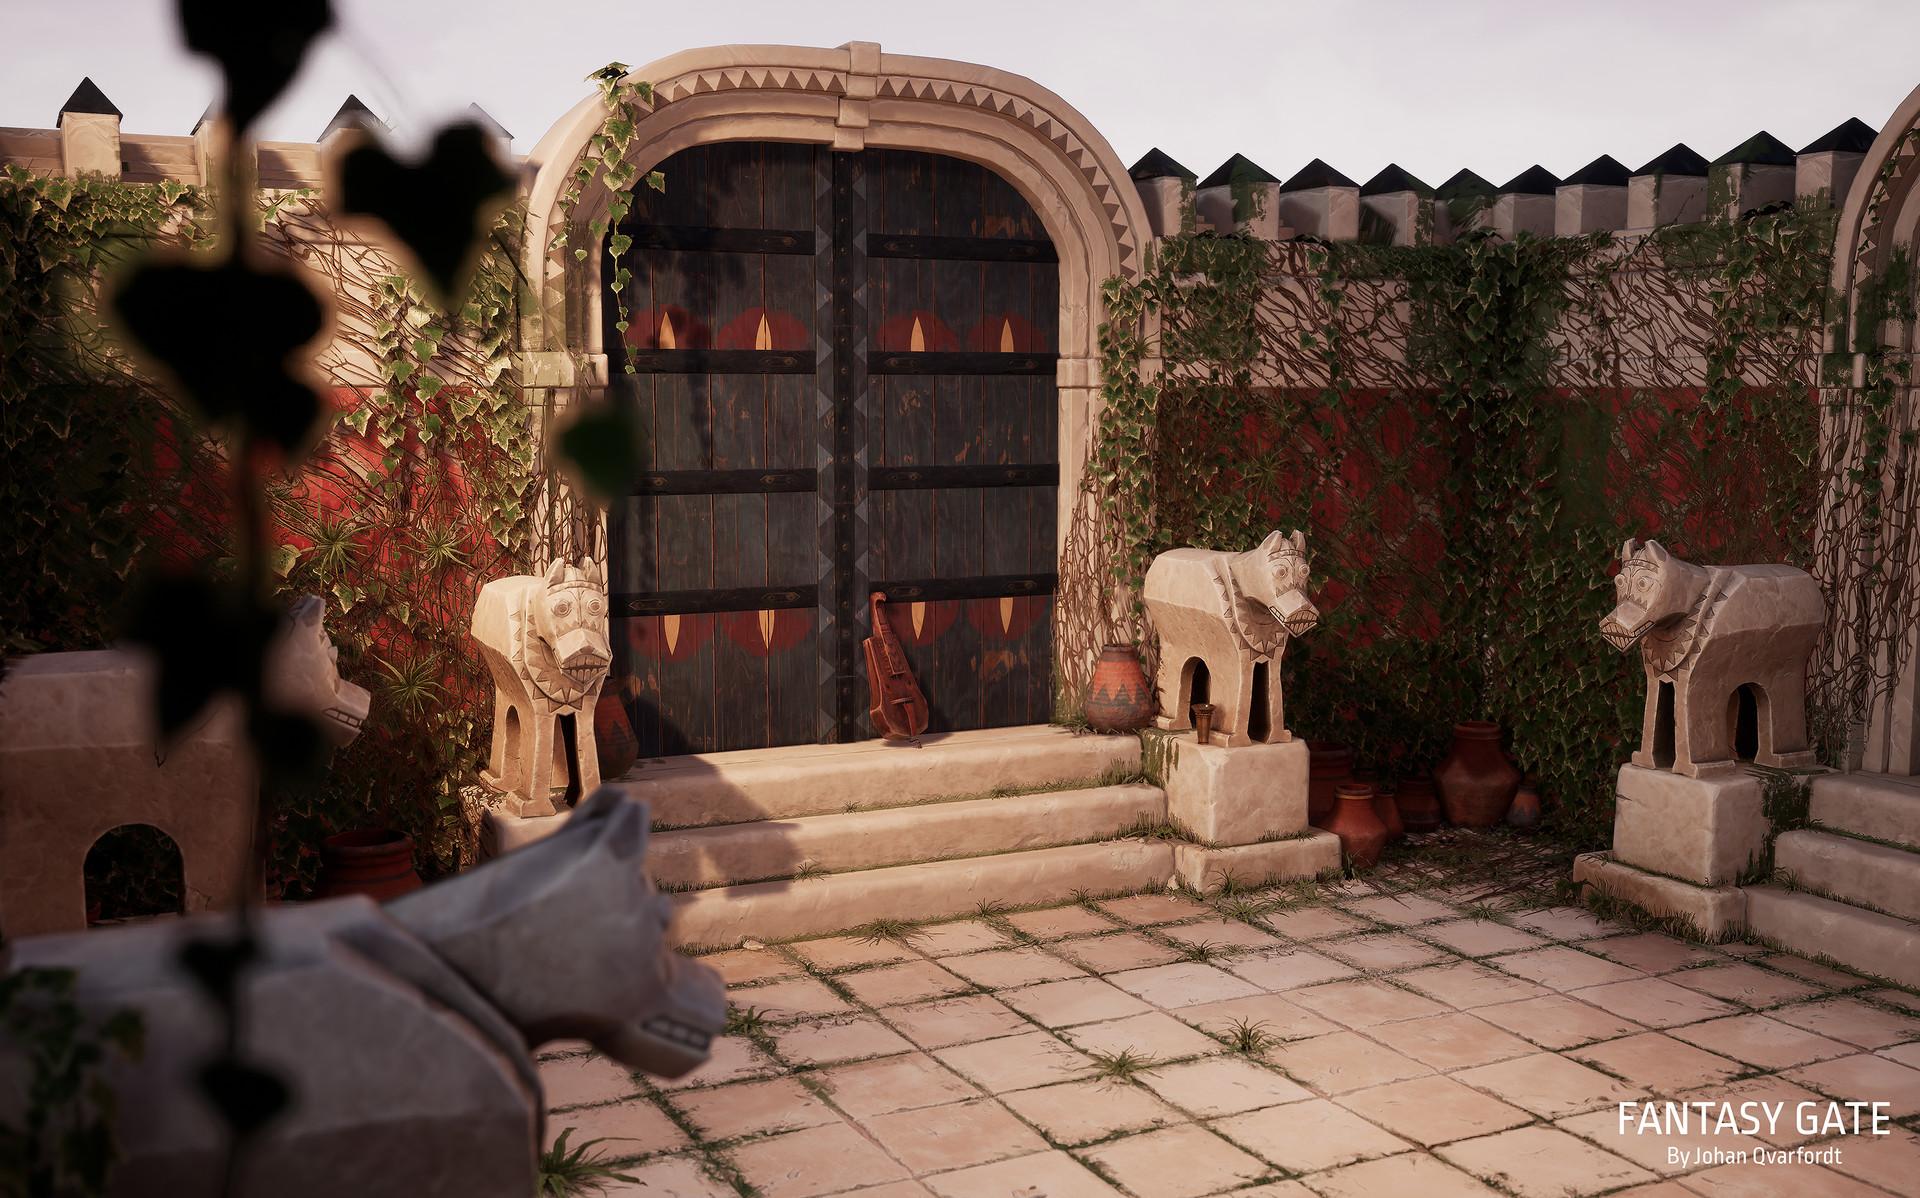 Johan qvarfordt fantasygate render 02 resized